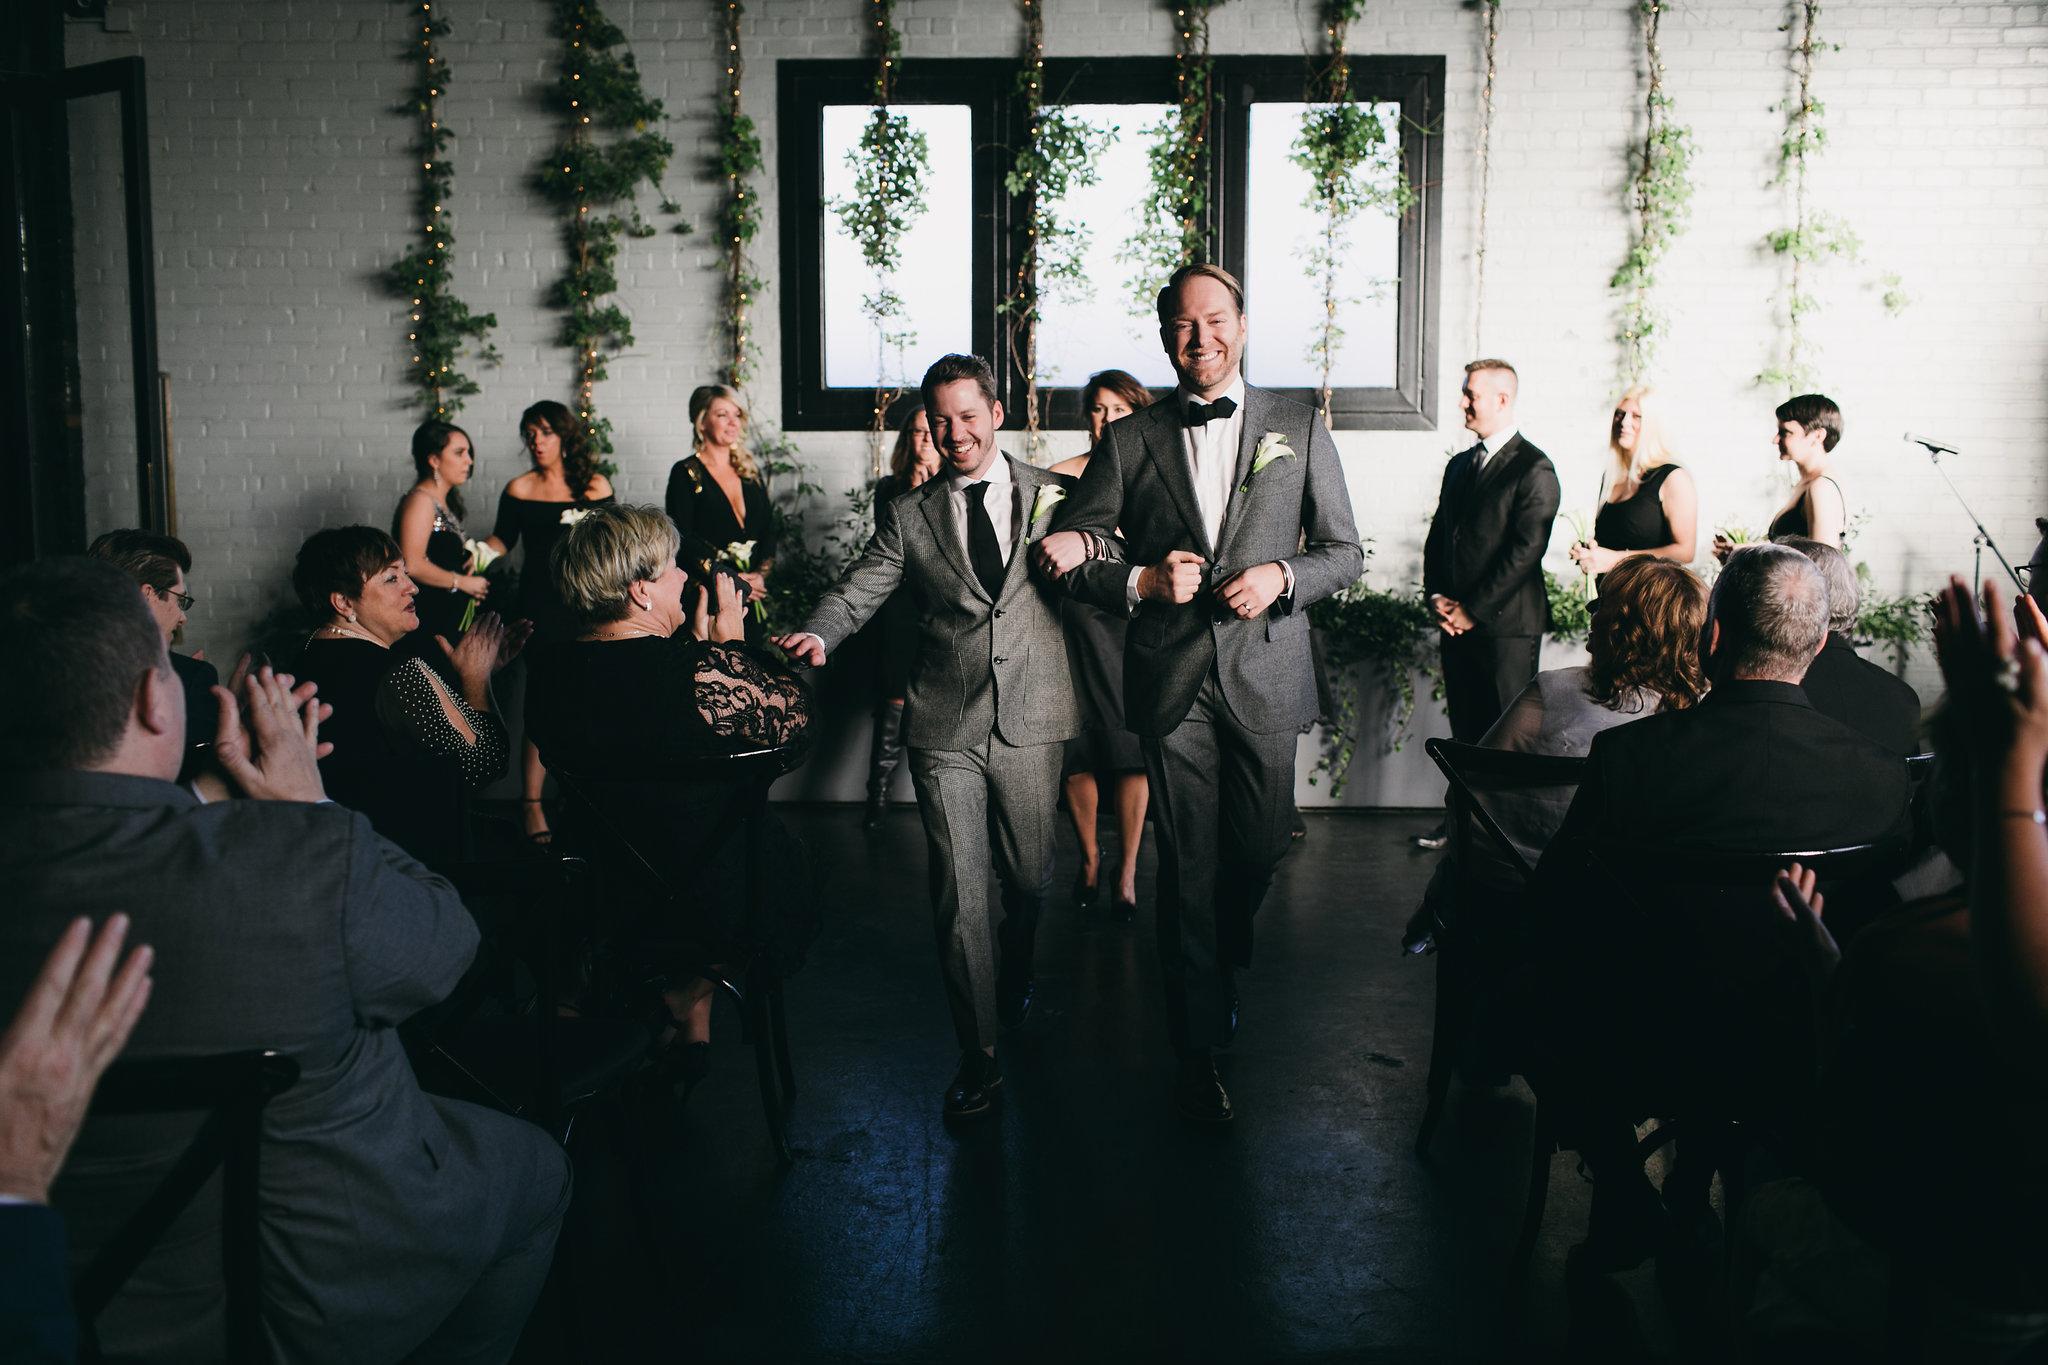 Peter-Eric-Wedding-355.jpg